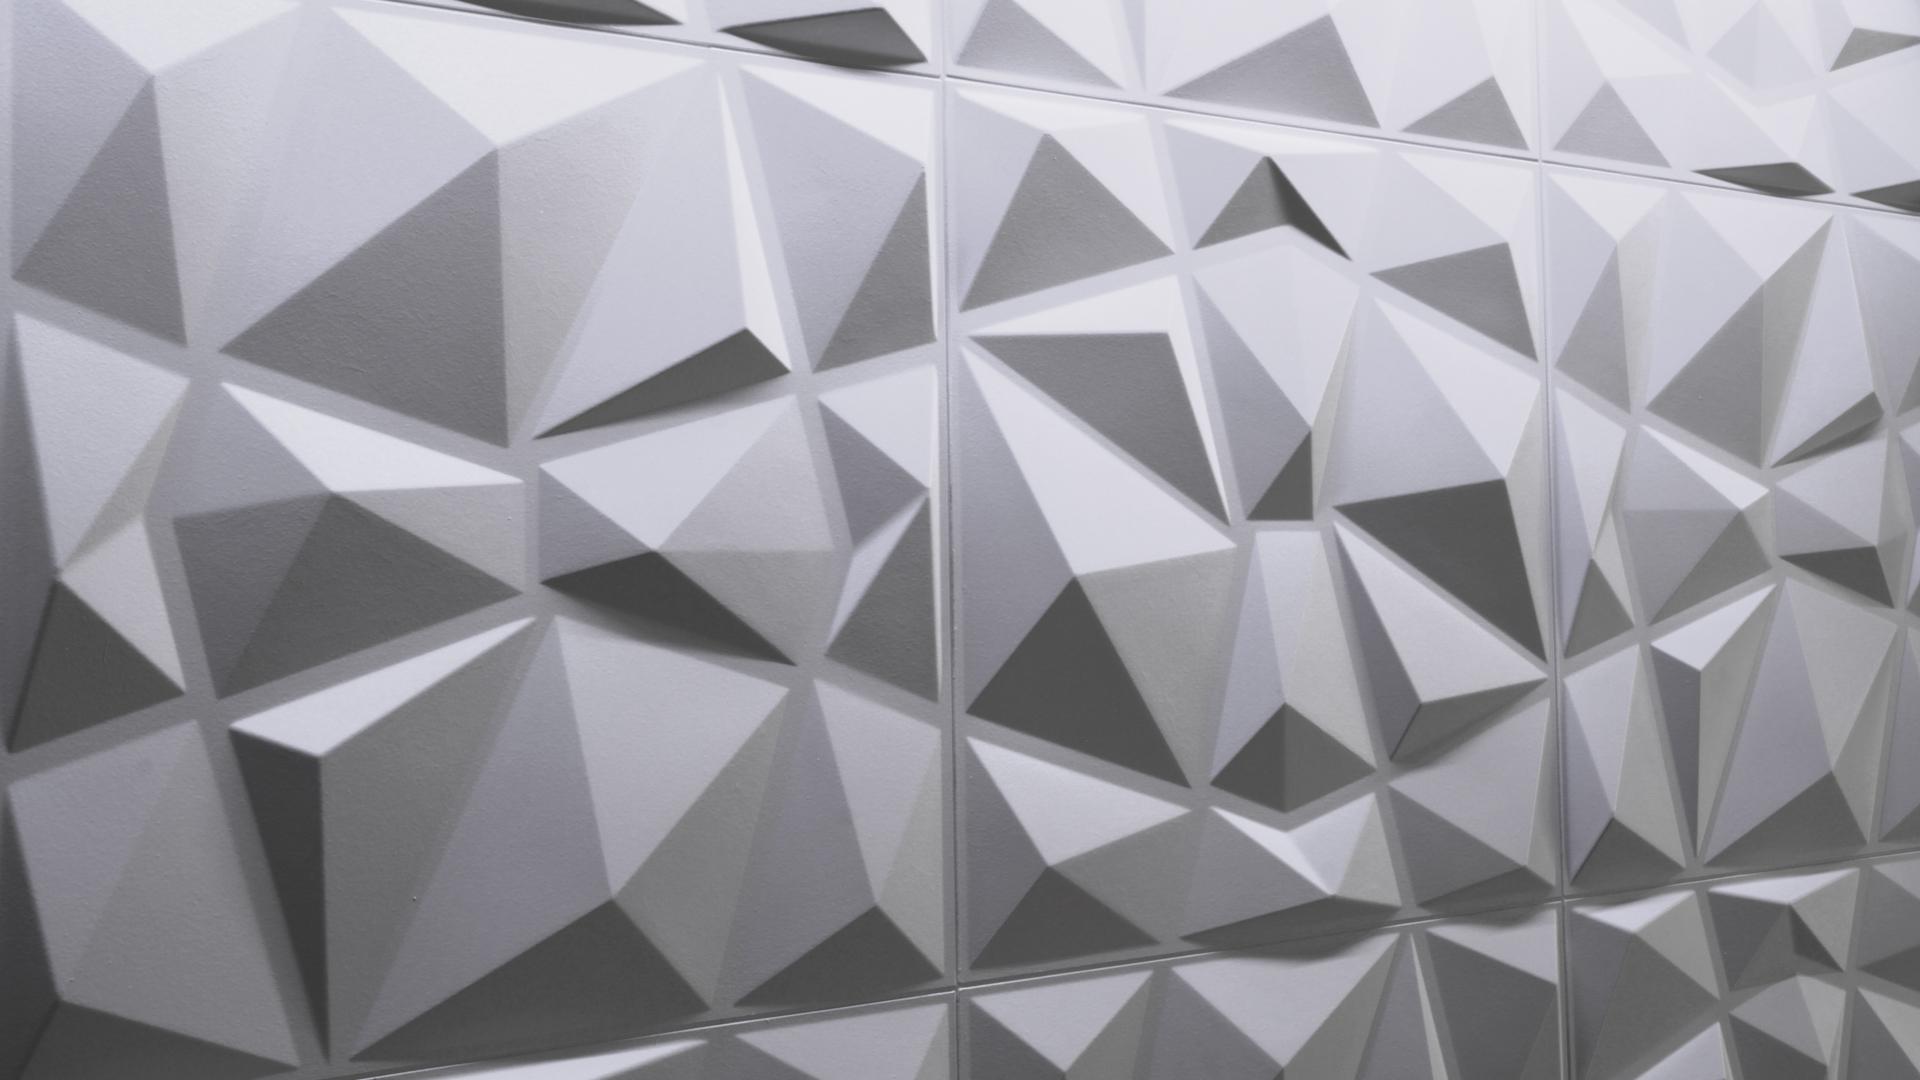 3d wandpaneele diamond wandverkleidung deckenpaneele 3d tapeten 3d wandpaneele. Black Bedroom Furniture Sets. Home Design Ideas